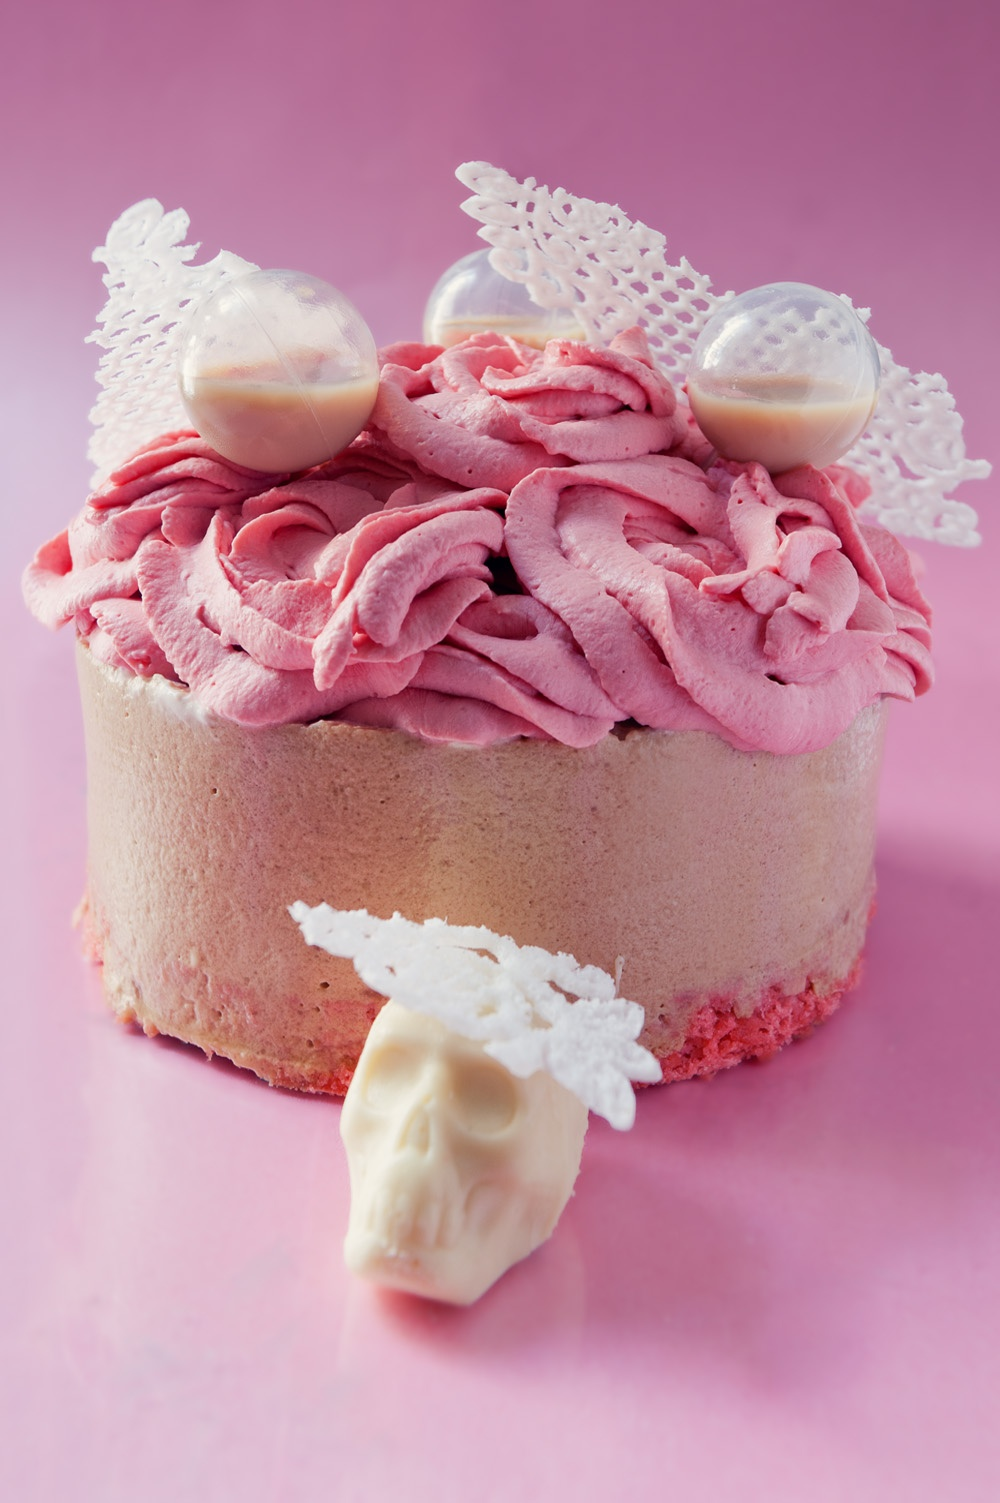 Arsenic & vieilles dentelles - Royal chocolat/baileys/framboise - Qui a vole les tartes ?